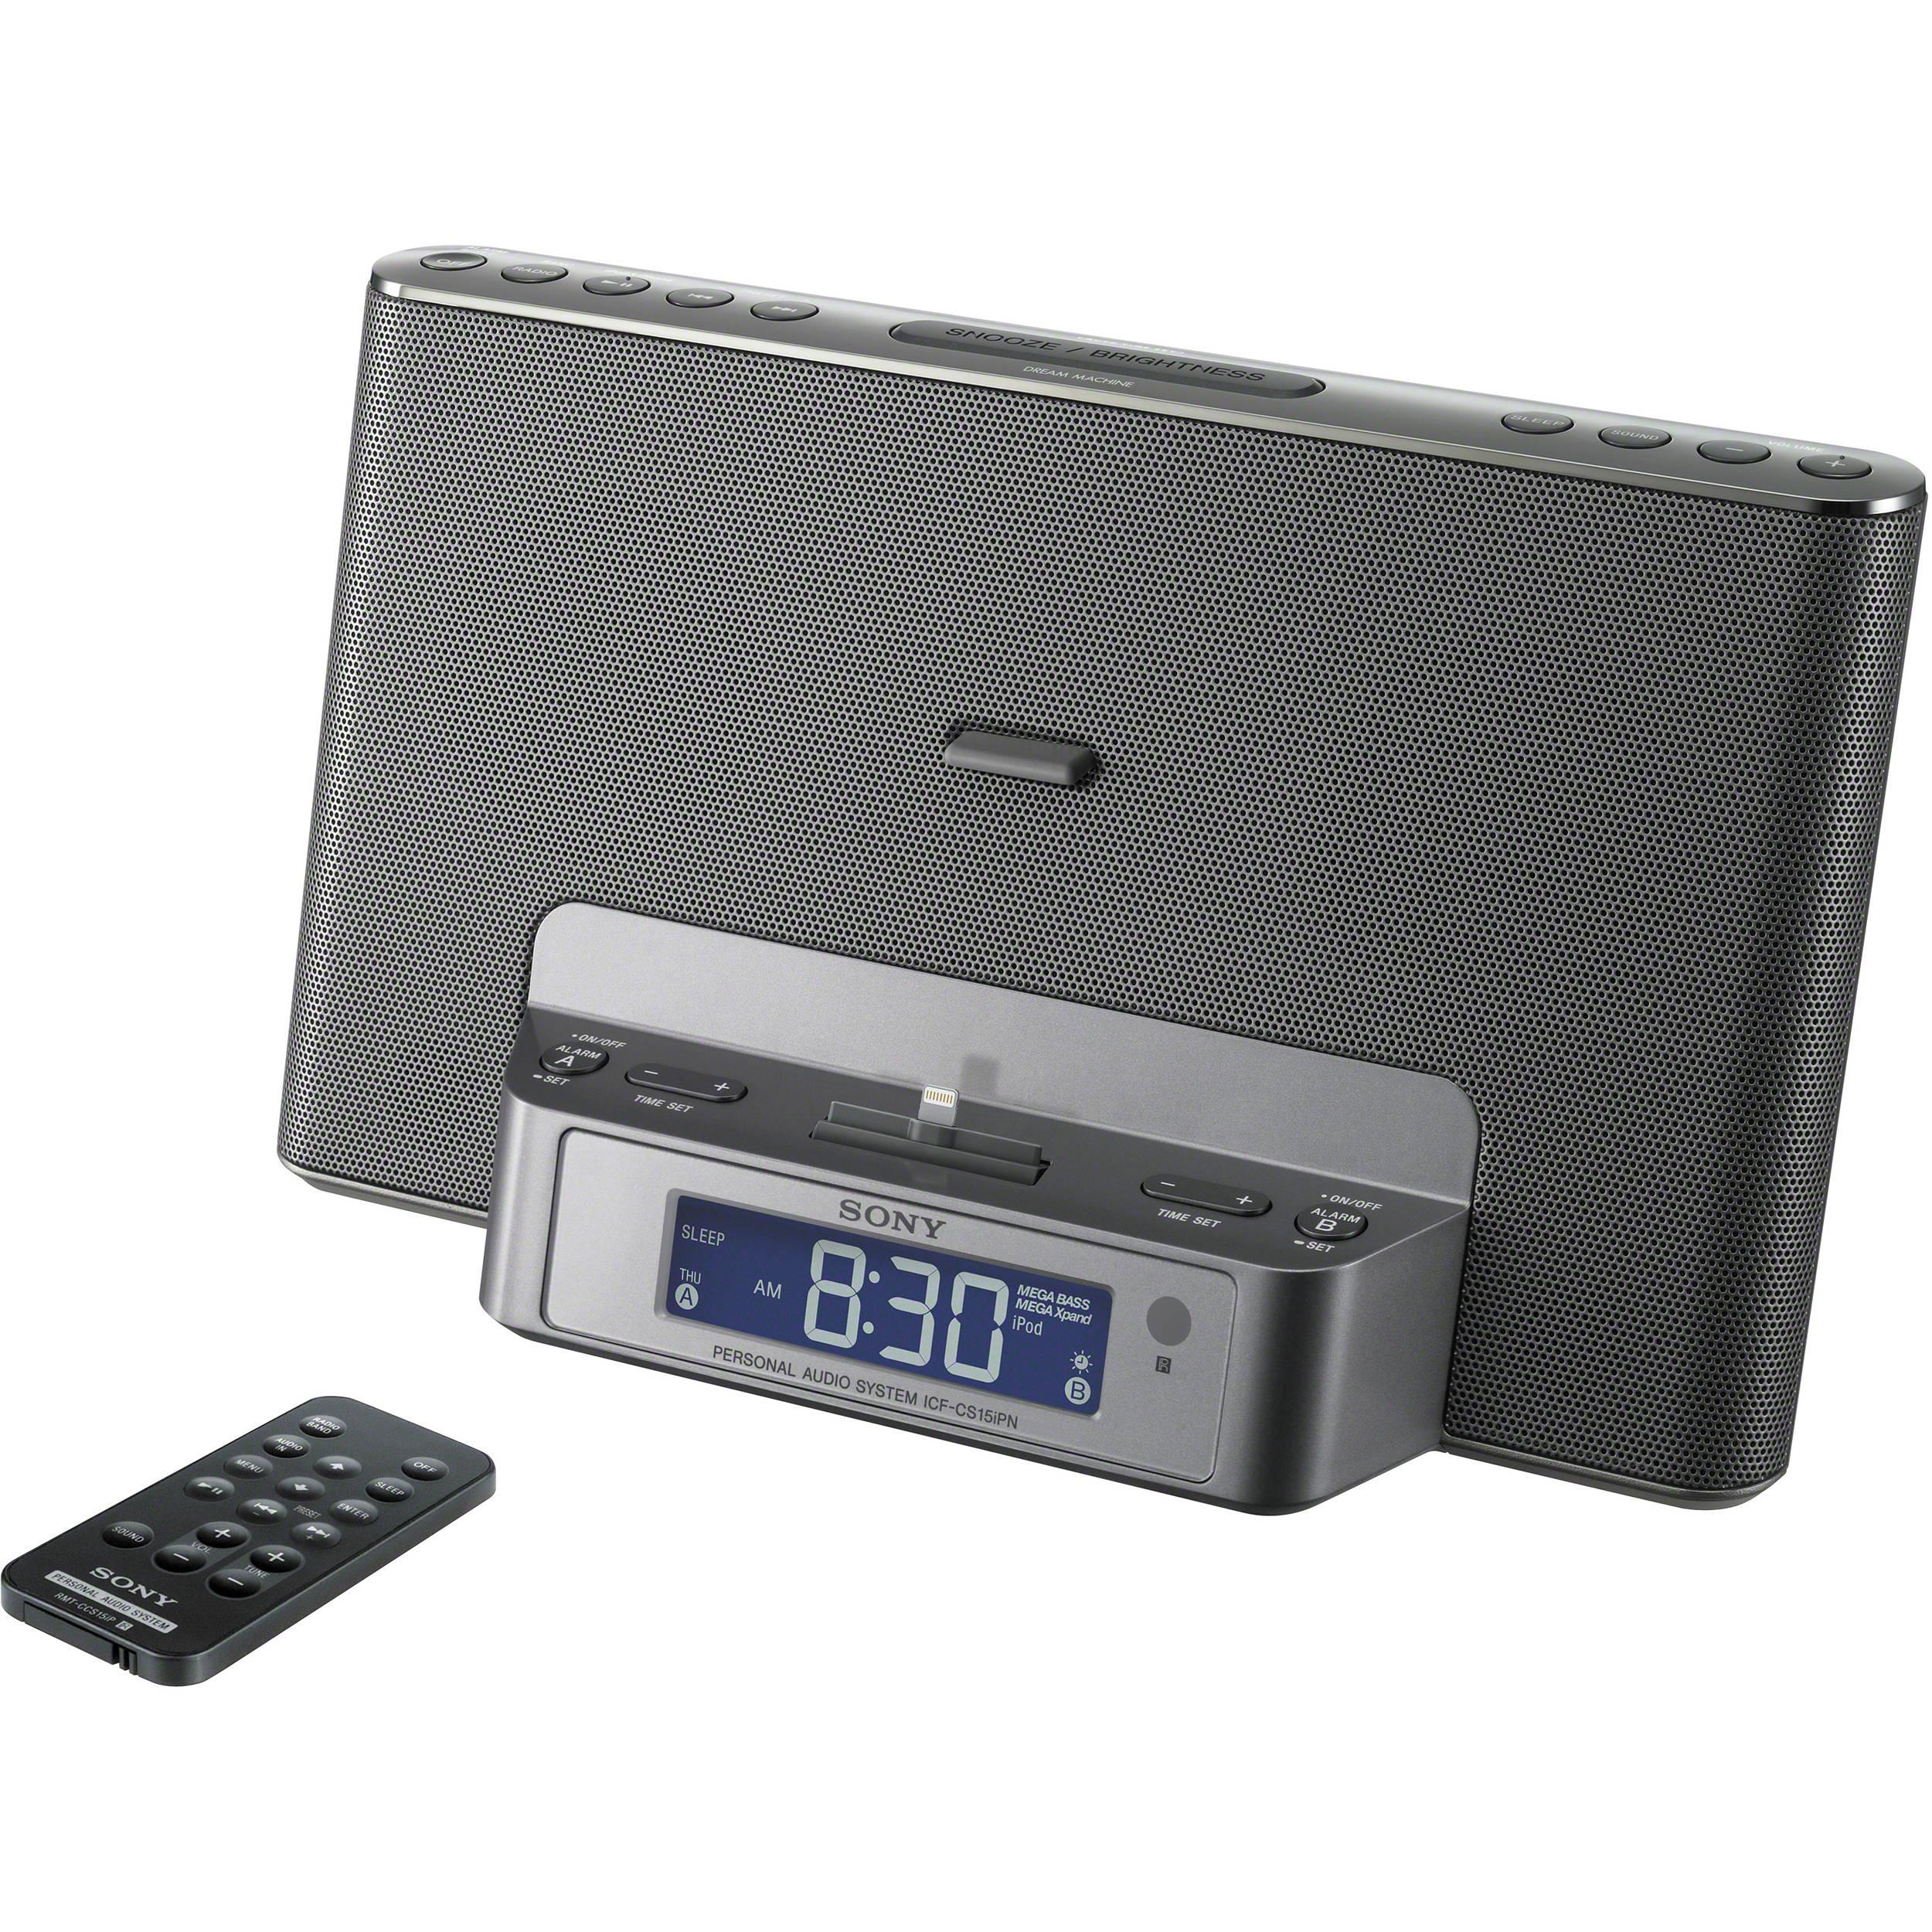 Sony ipod speaker dock clock radio